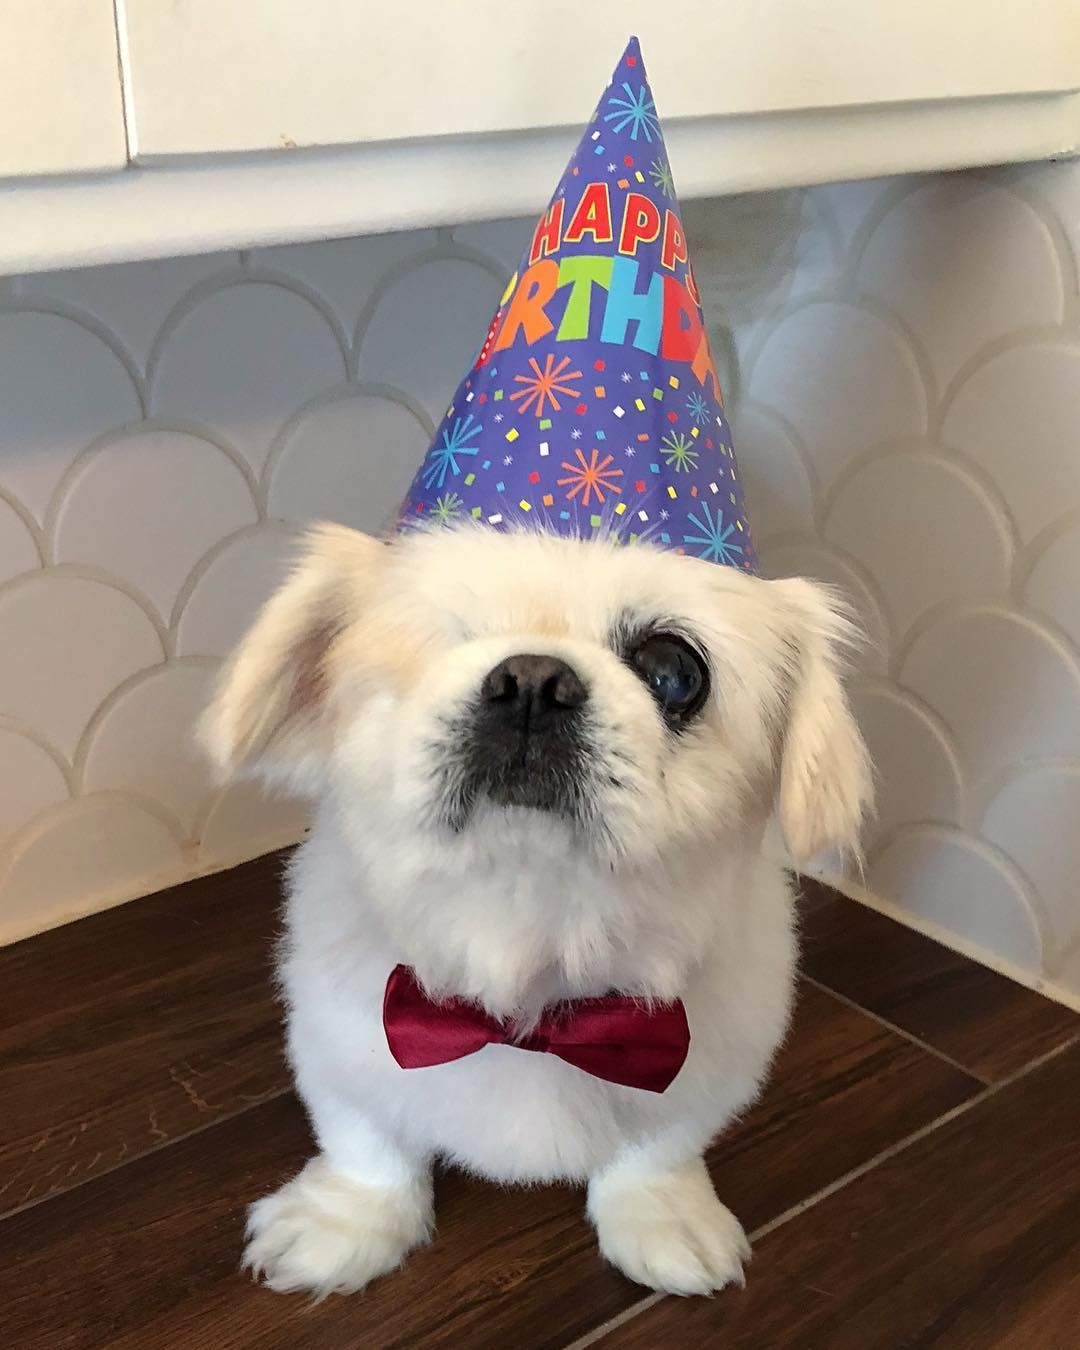 Happy birthday to me!!! . . . . Dog gifts, Pekingese